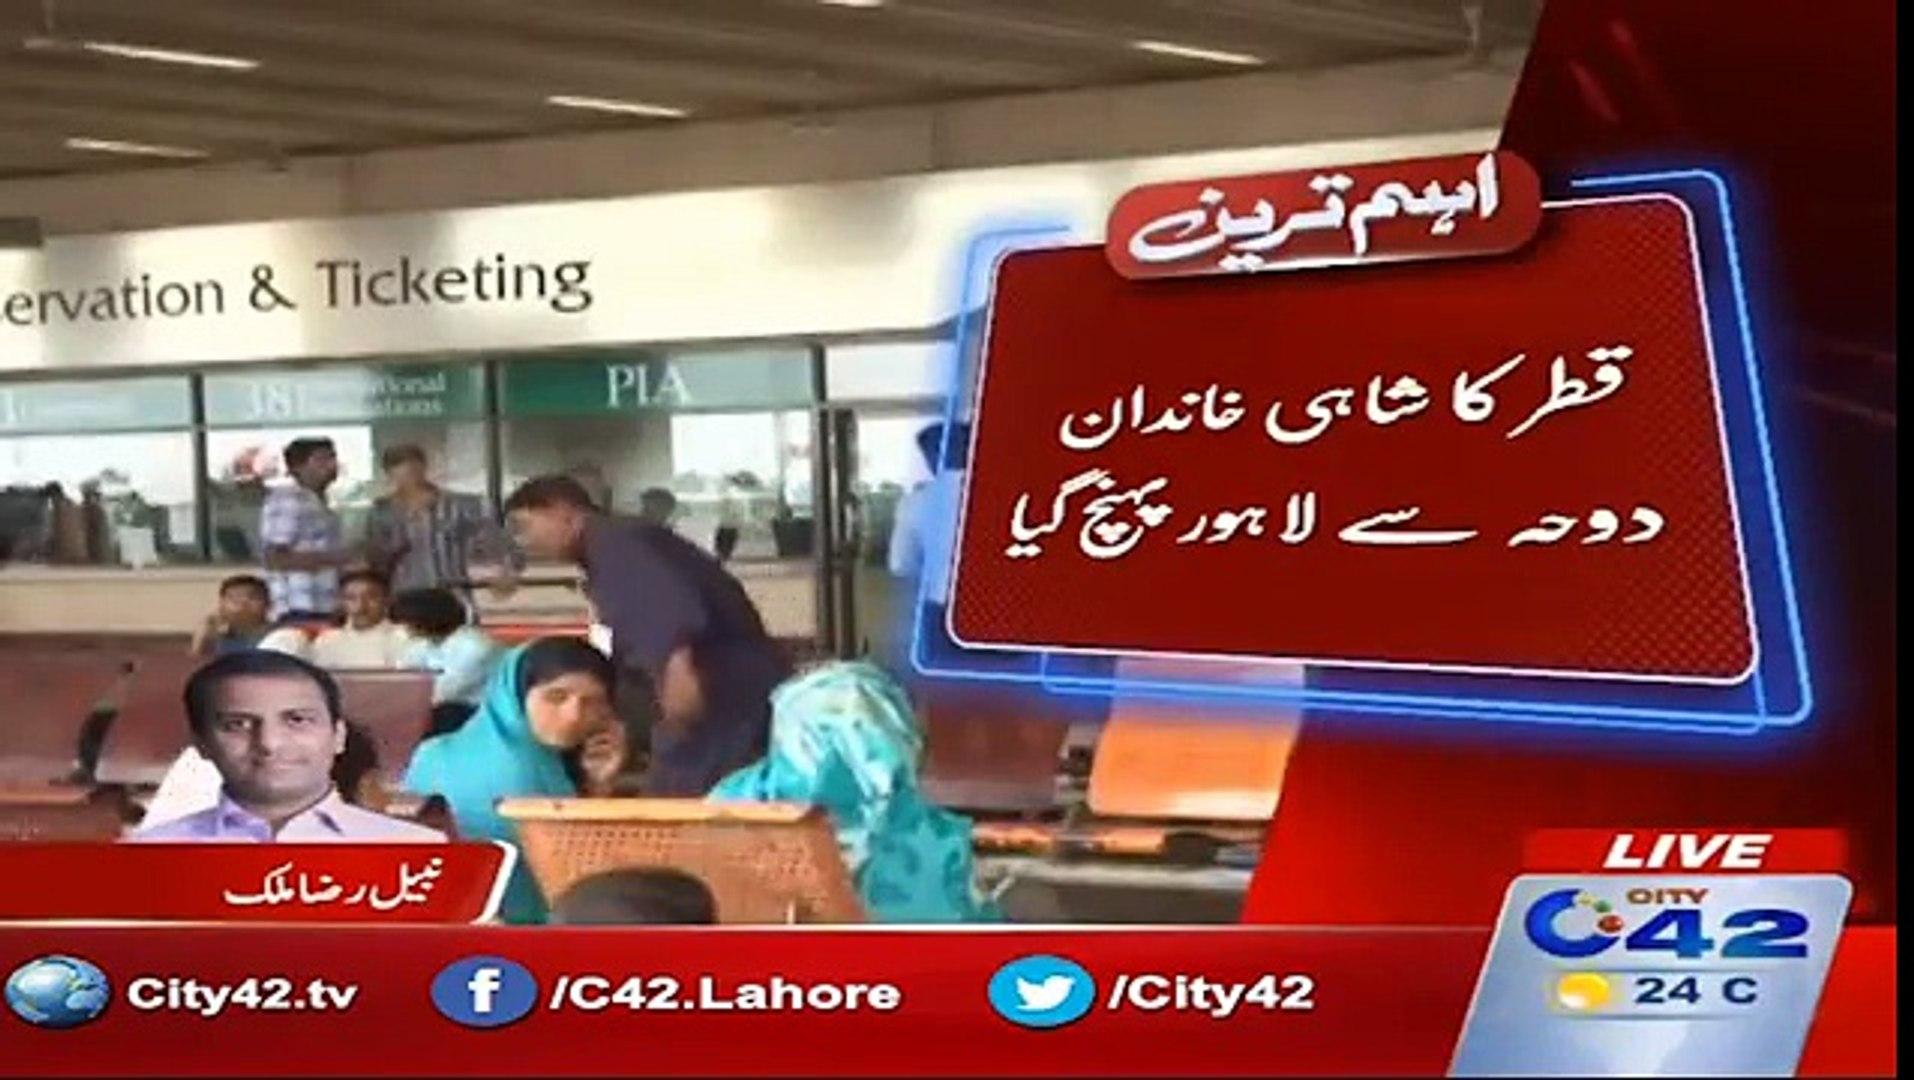 Royal Family of Qatar reaches Lahore - Hassan Nawaz receives them